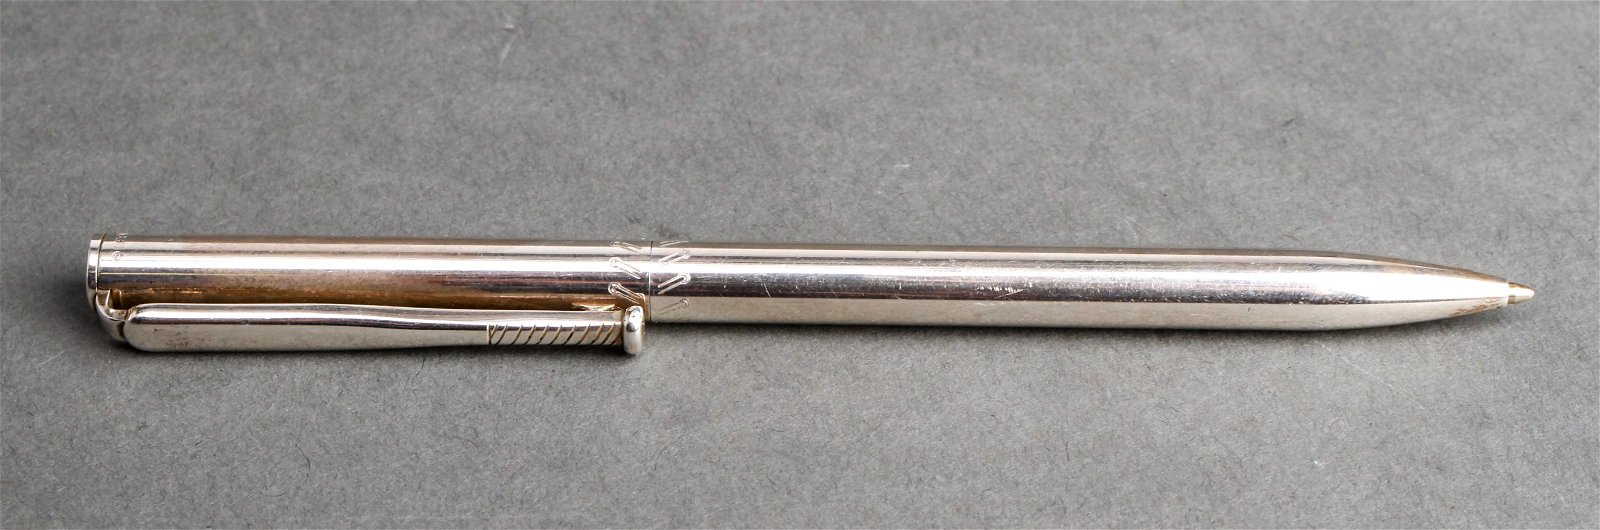 Tiffany & Co. Silver Ballpoint Pen Baseball Bat